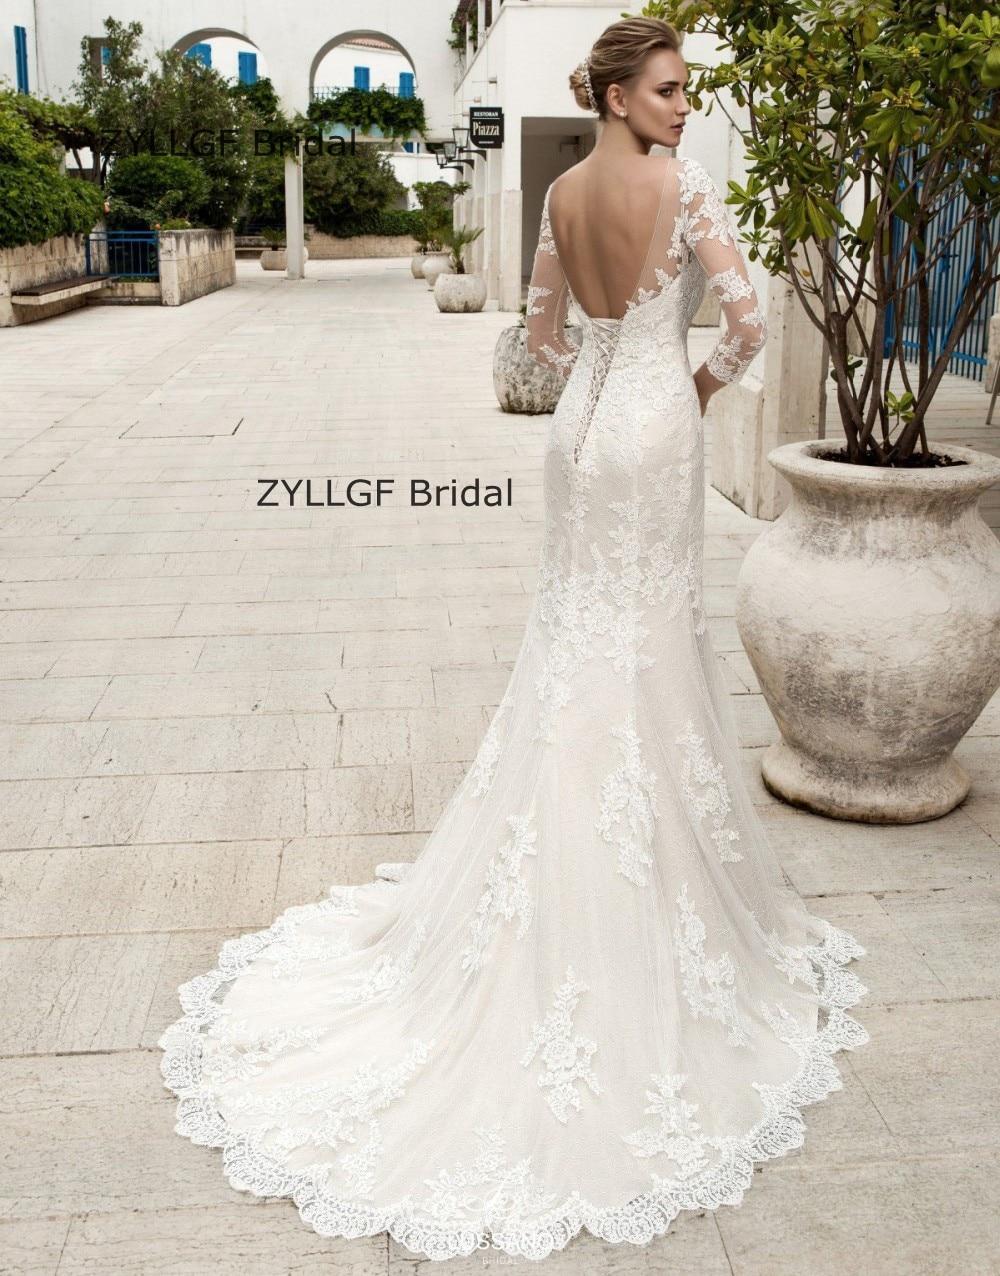 ZYLLGF Bridal Sexy Low Back Boat Neck Wedding Dress Mermaid Lace Corset  Wedding Gown Long Sleeve Vestido De Novias 2017 TN183 In Wedding Dresses  From ...